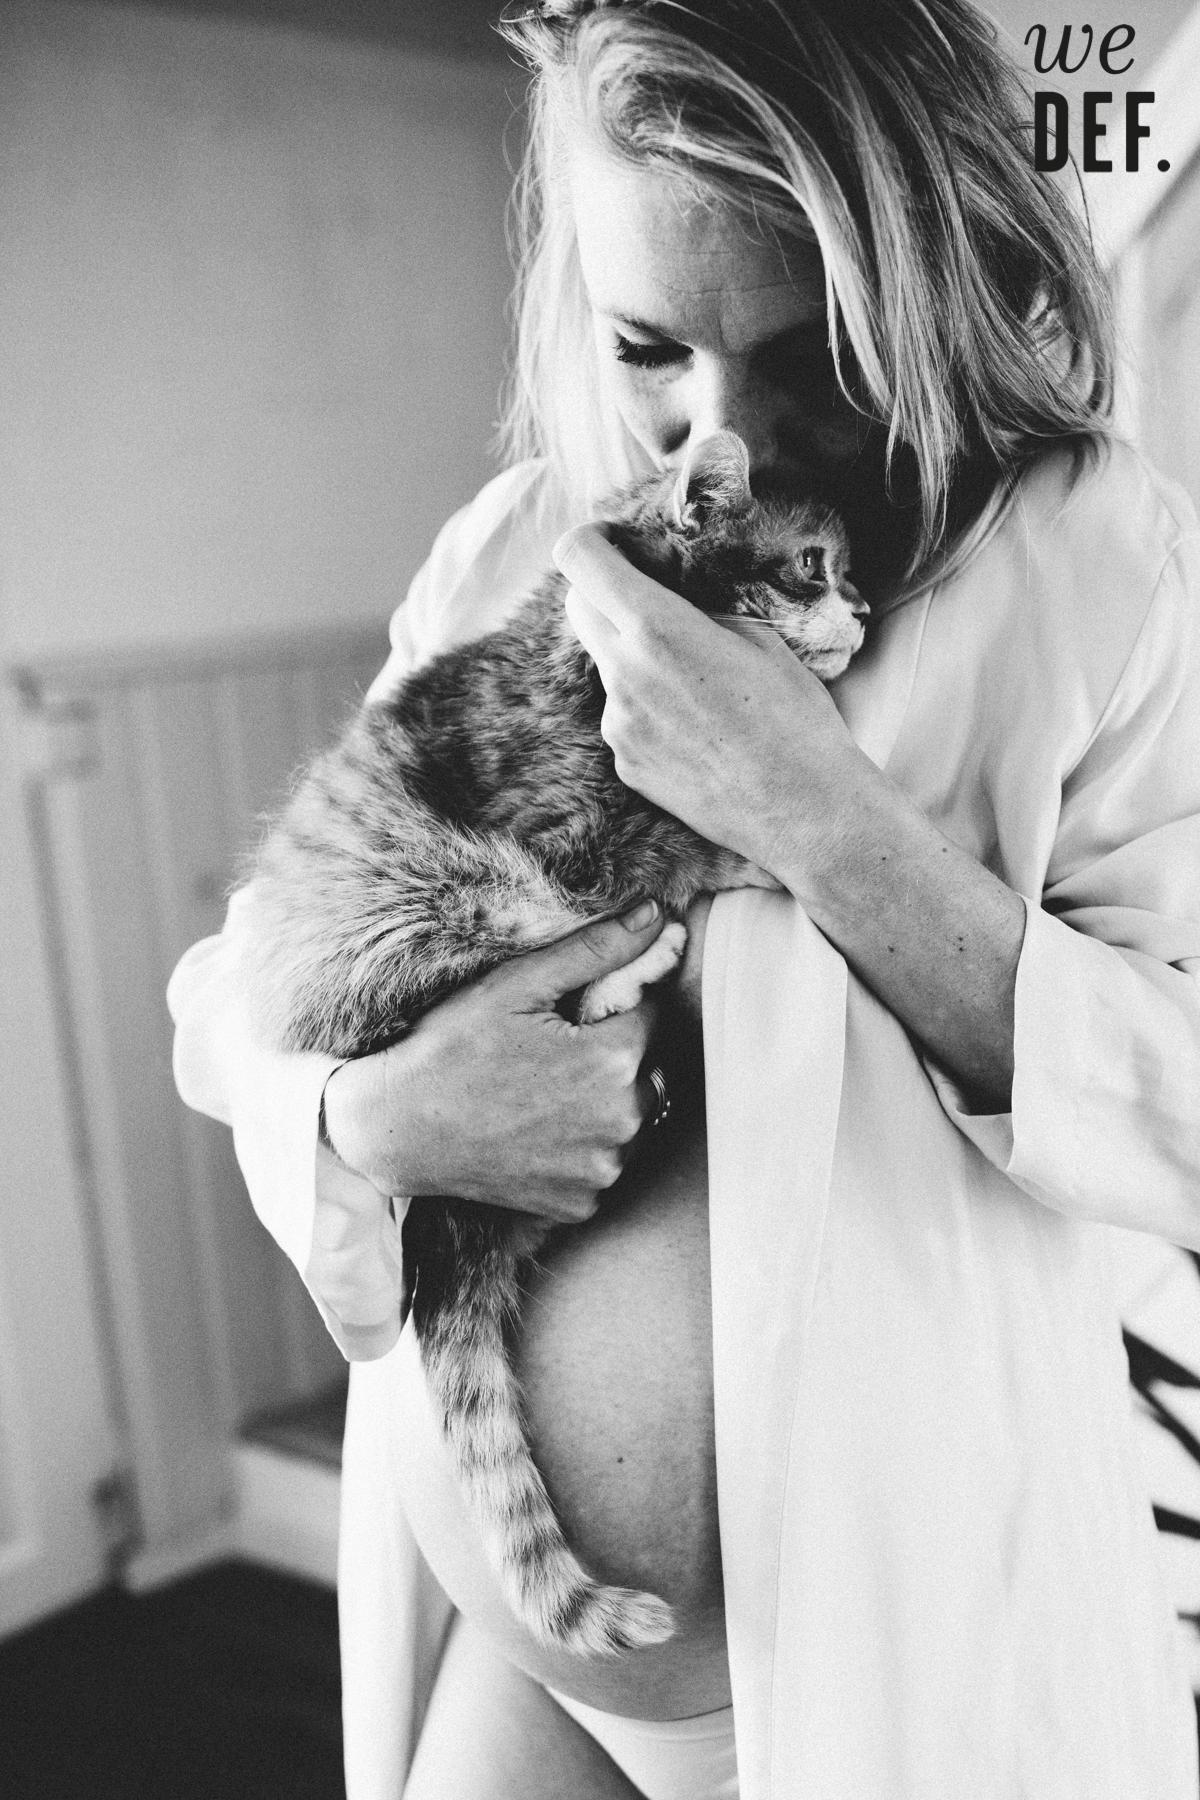 WeDefinitely_fotografie_zwangerschapsshoot_model_thuis_limburg_bijzonder_niet_standaard_fotografen-2